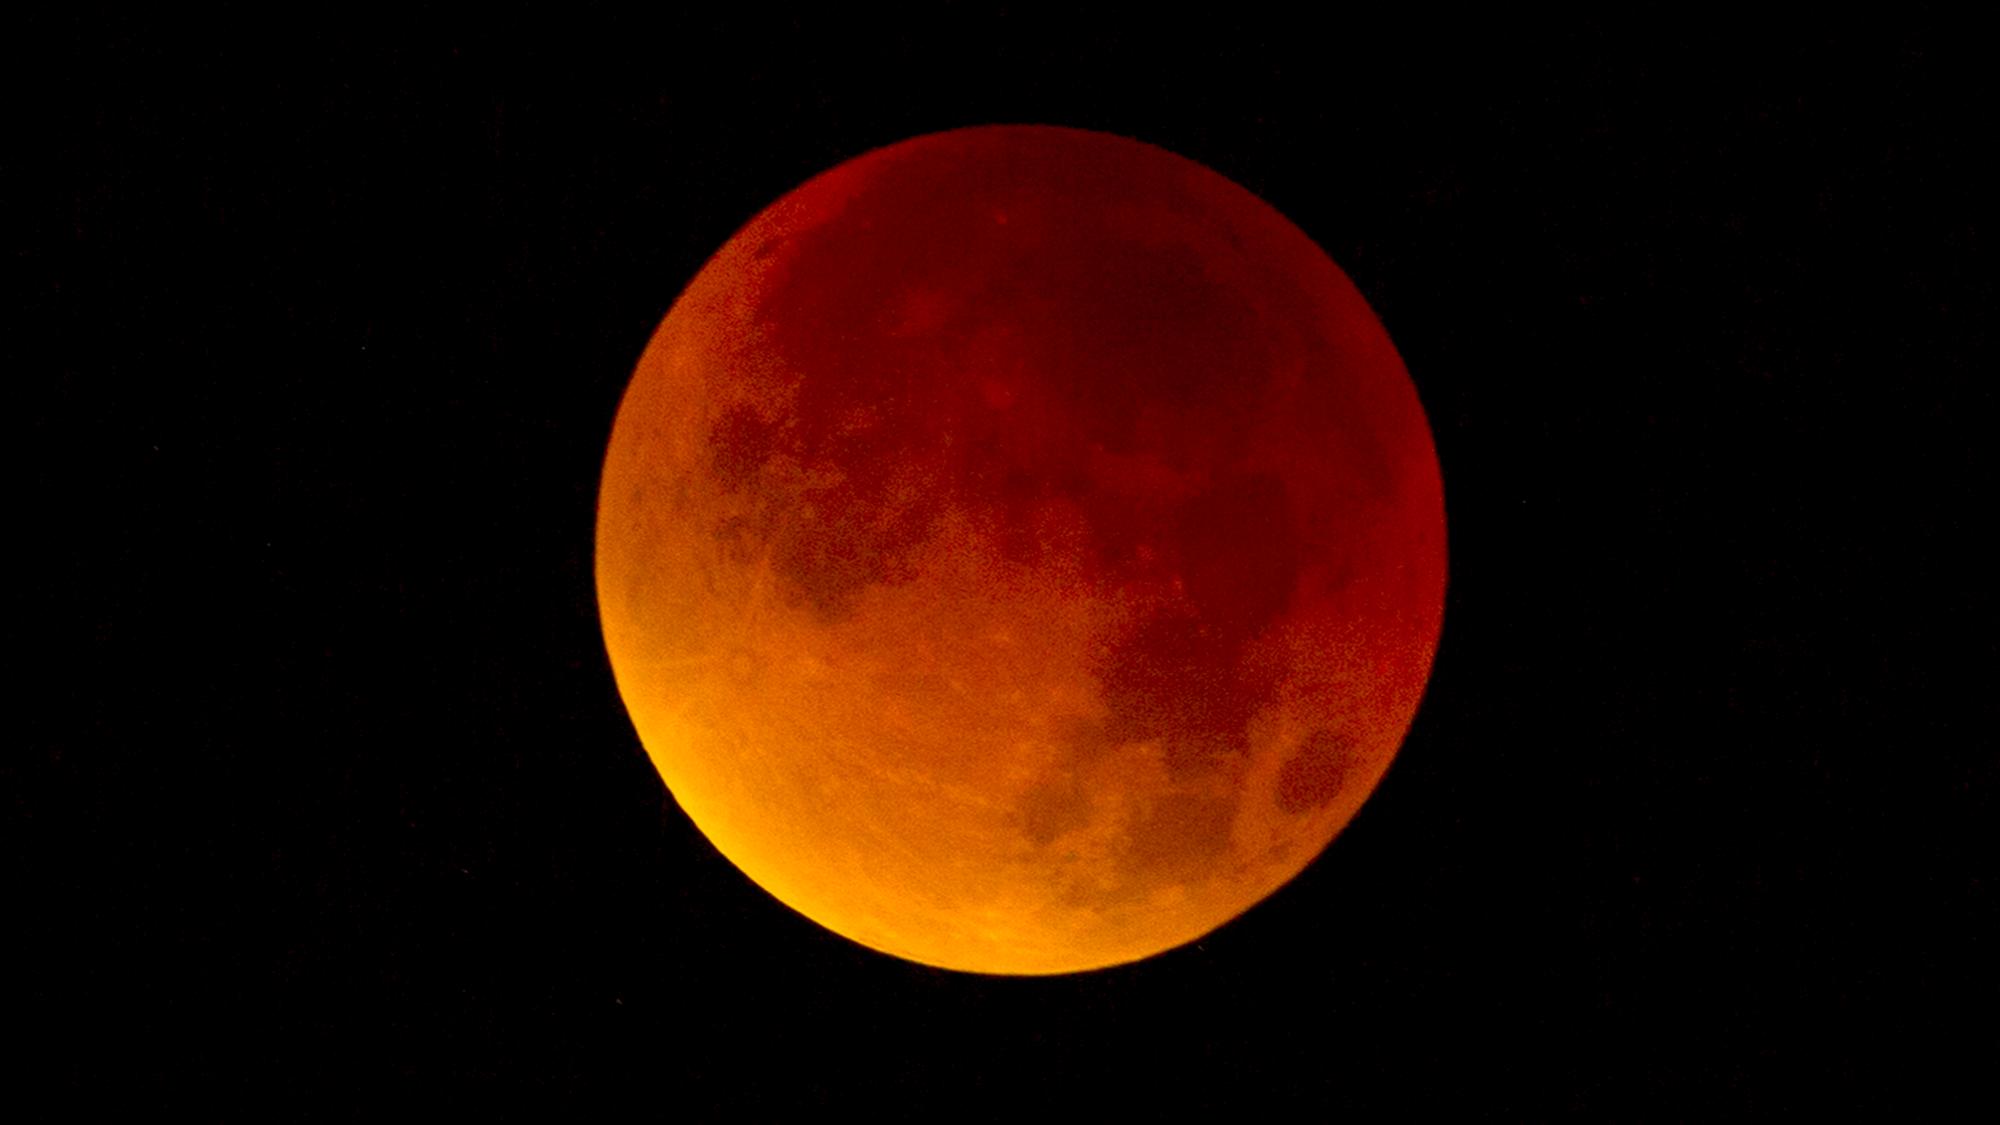 Lunar Eclipse- January 31, 2018